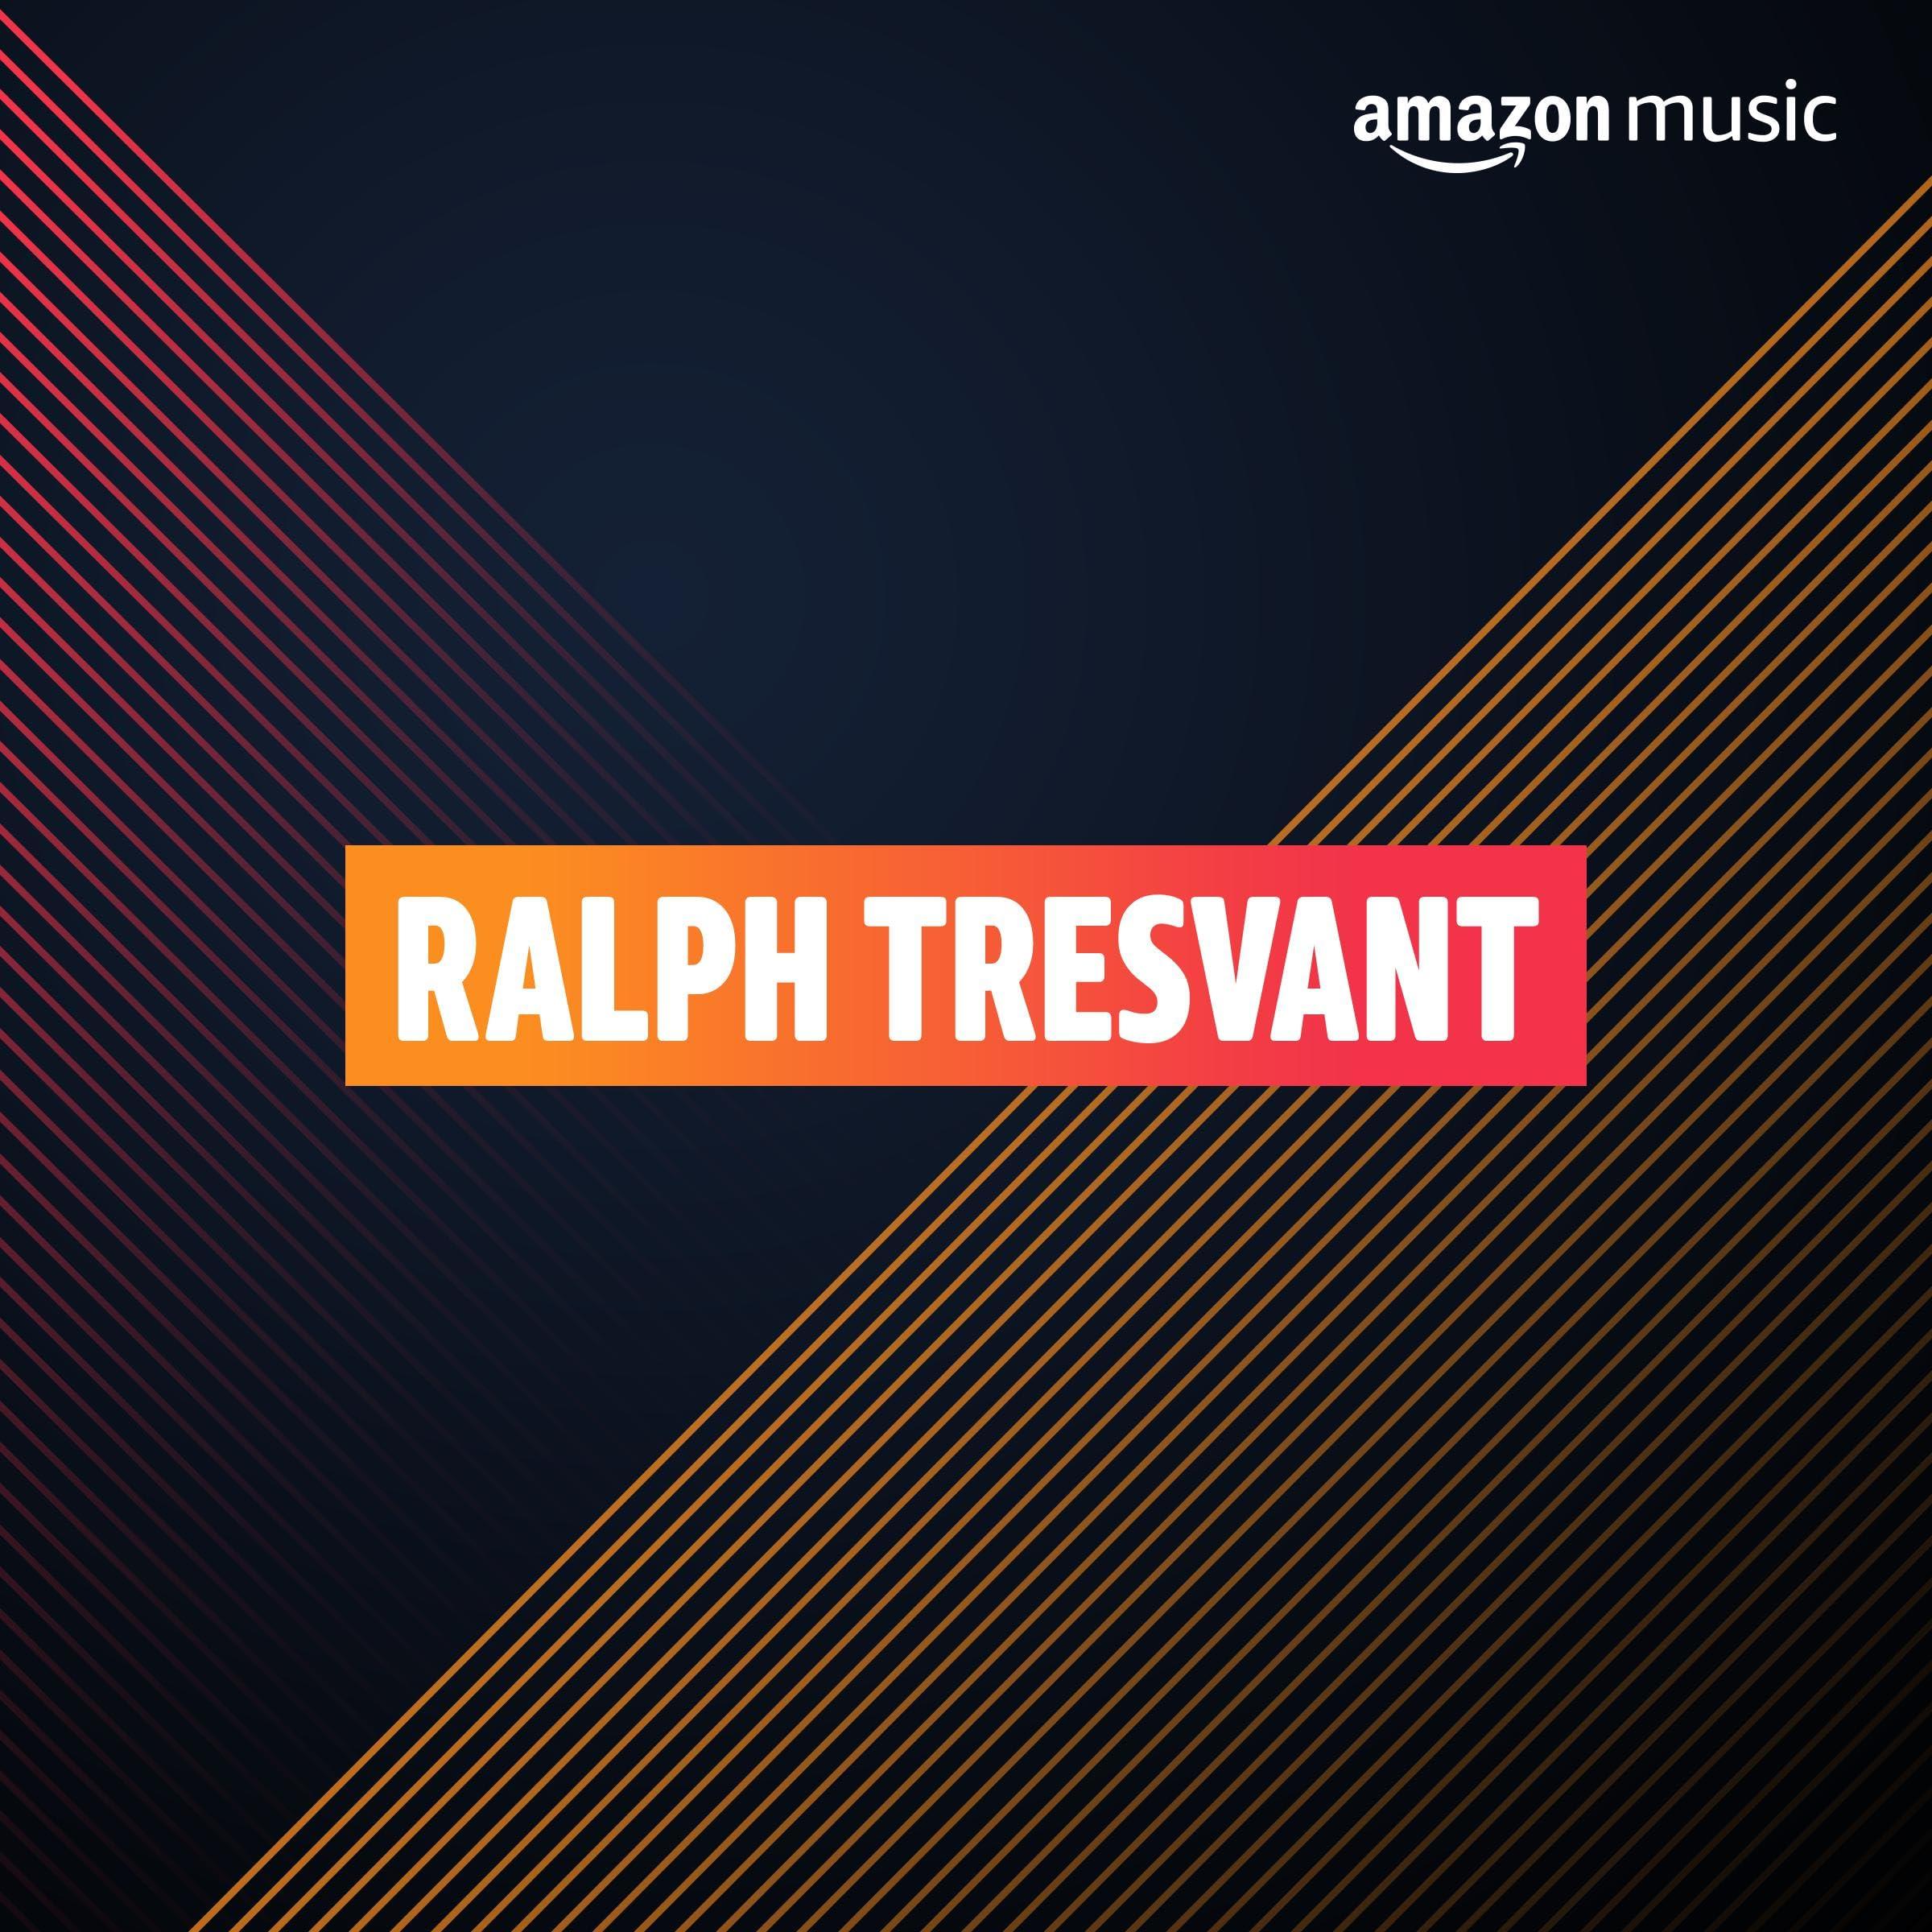 Ralph Tresvant